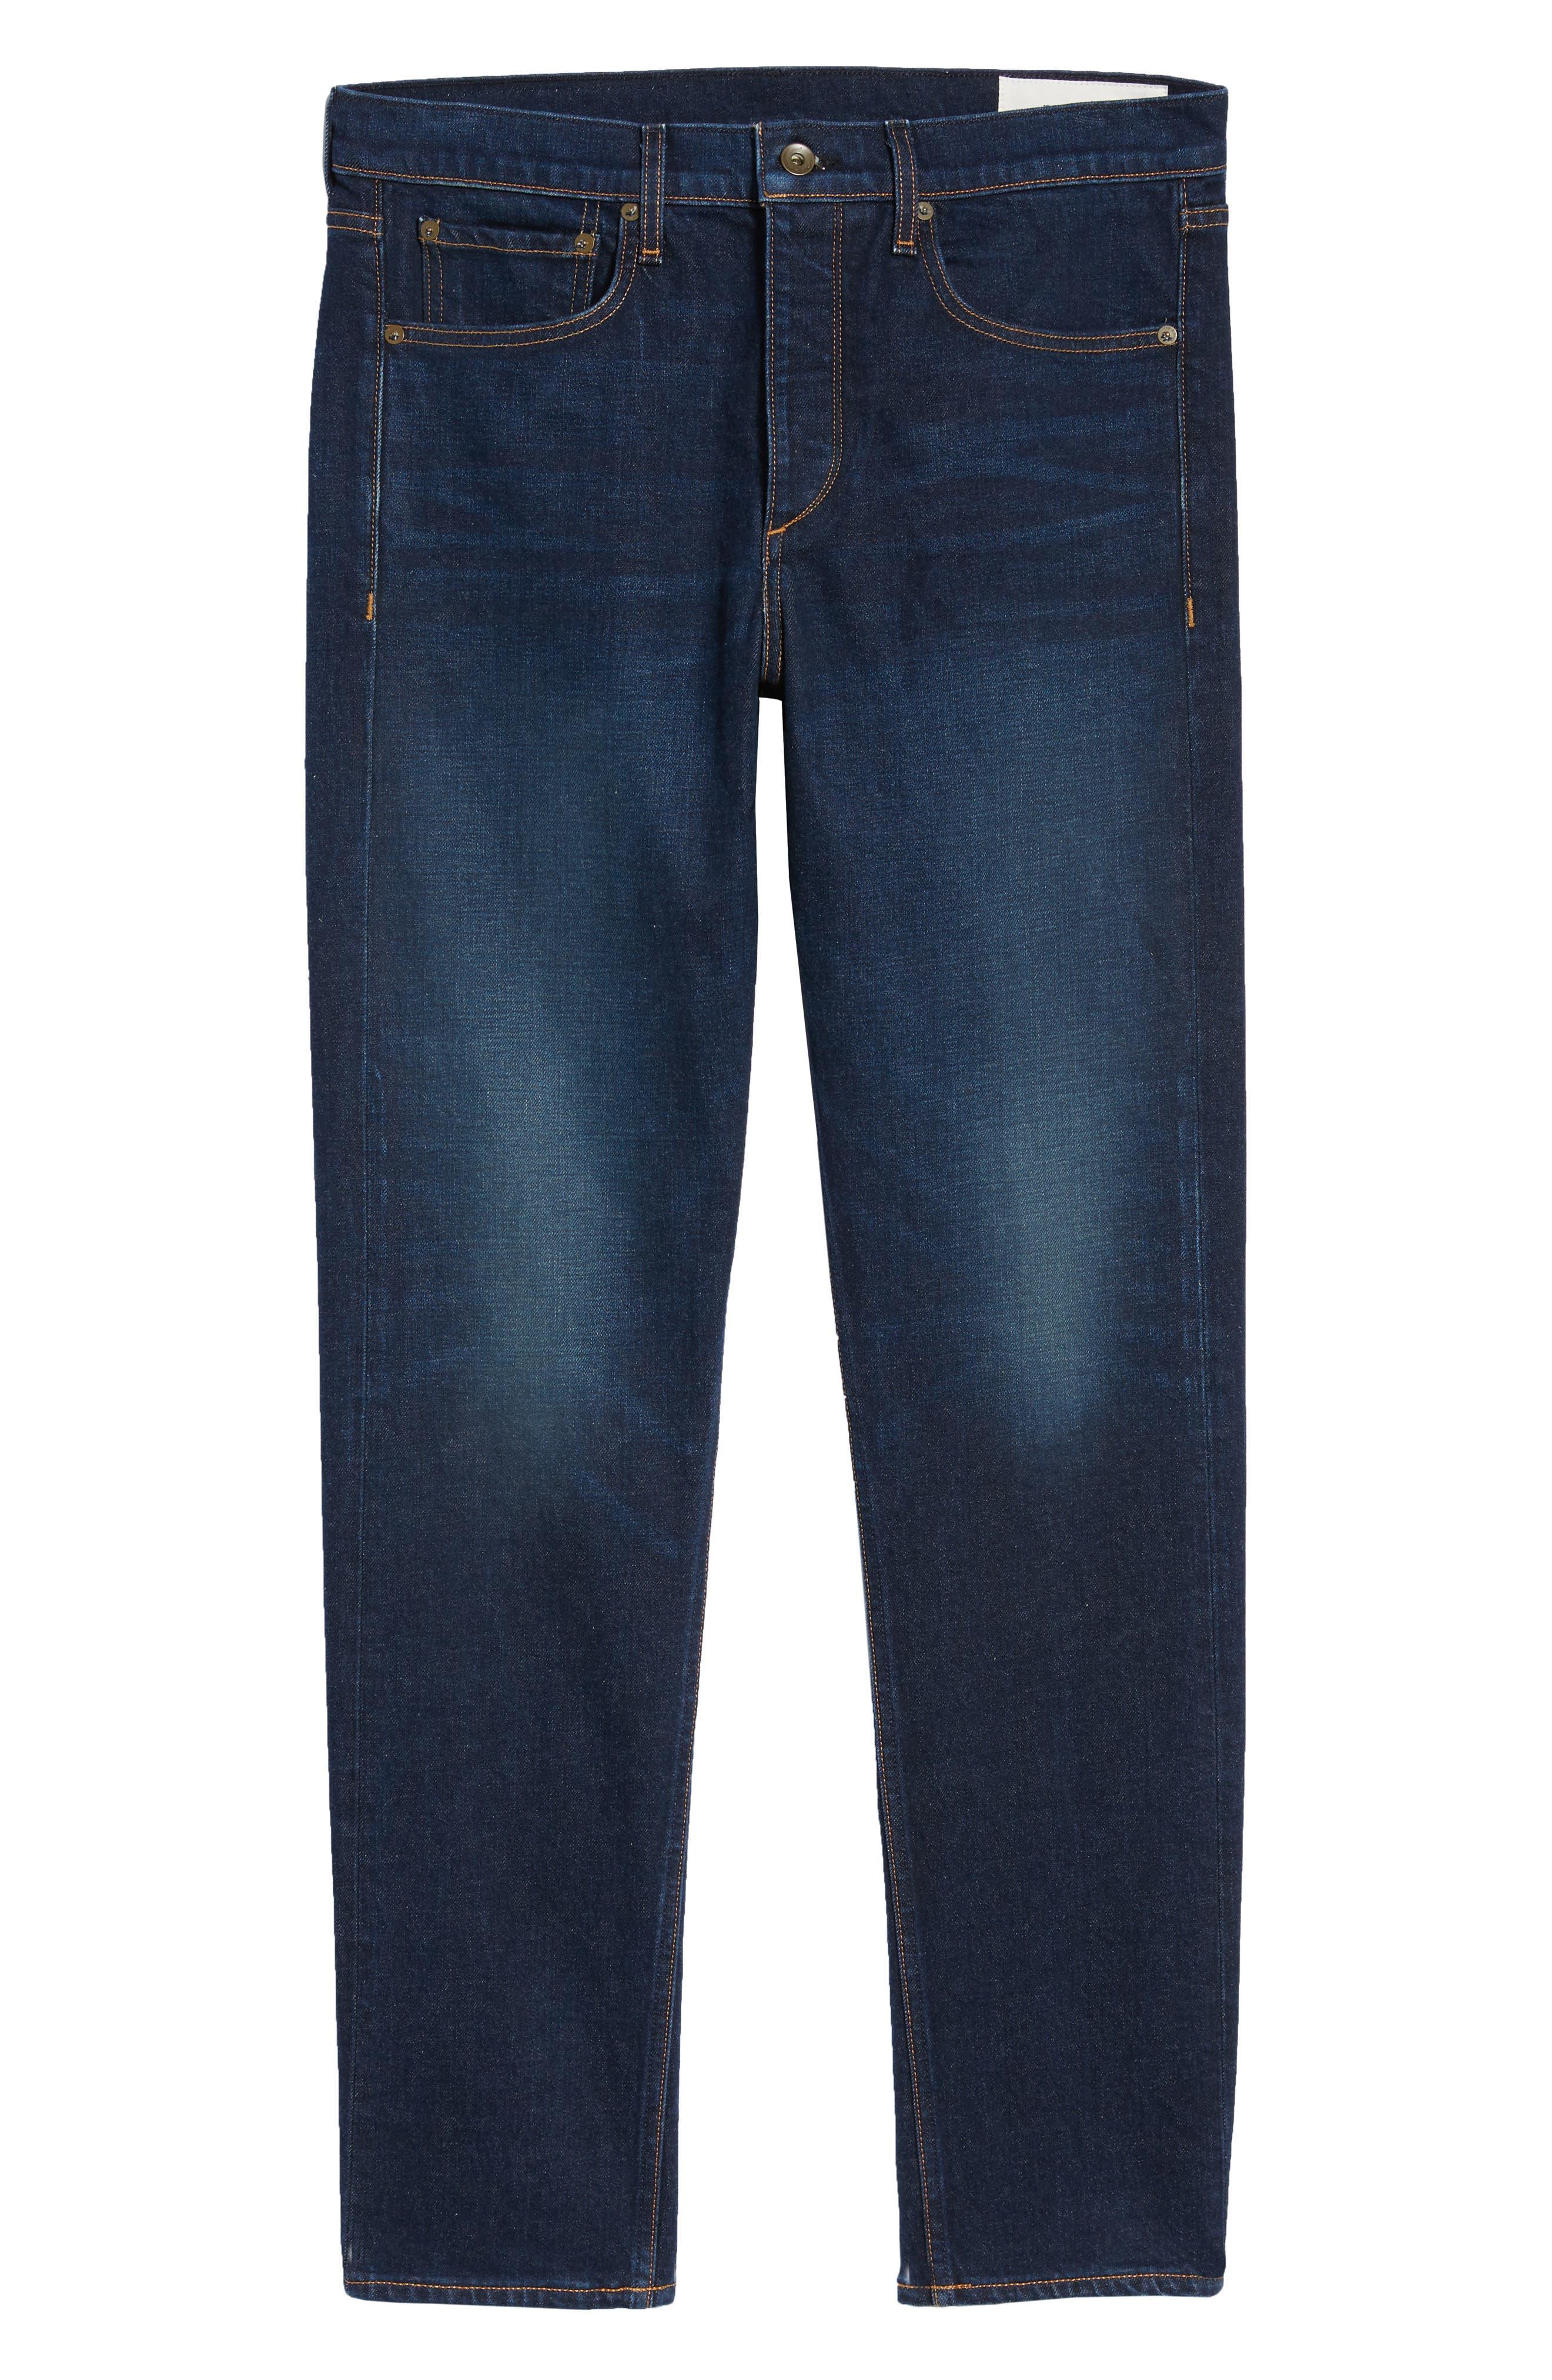 Fit 3 Straight Leg Jeans,                             Alternate thumbnail 6, color,                             ACE